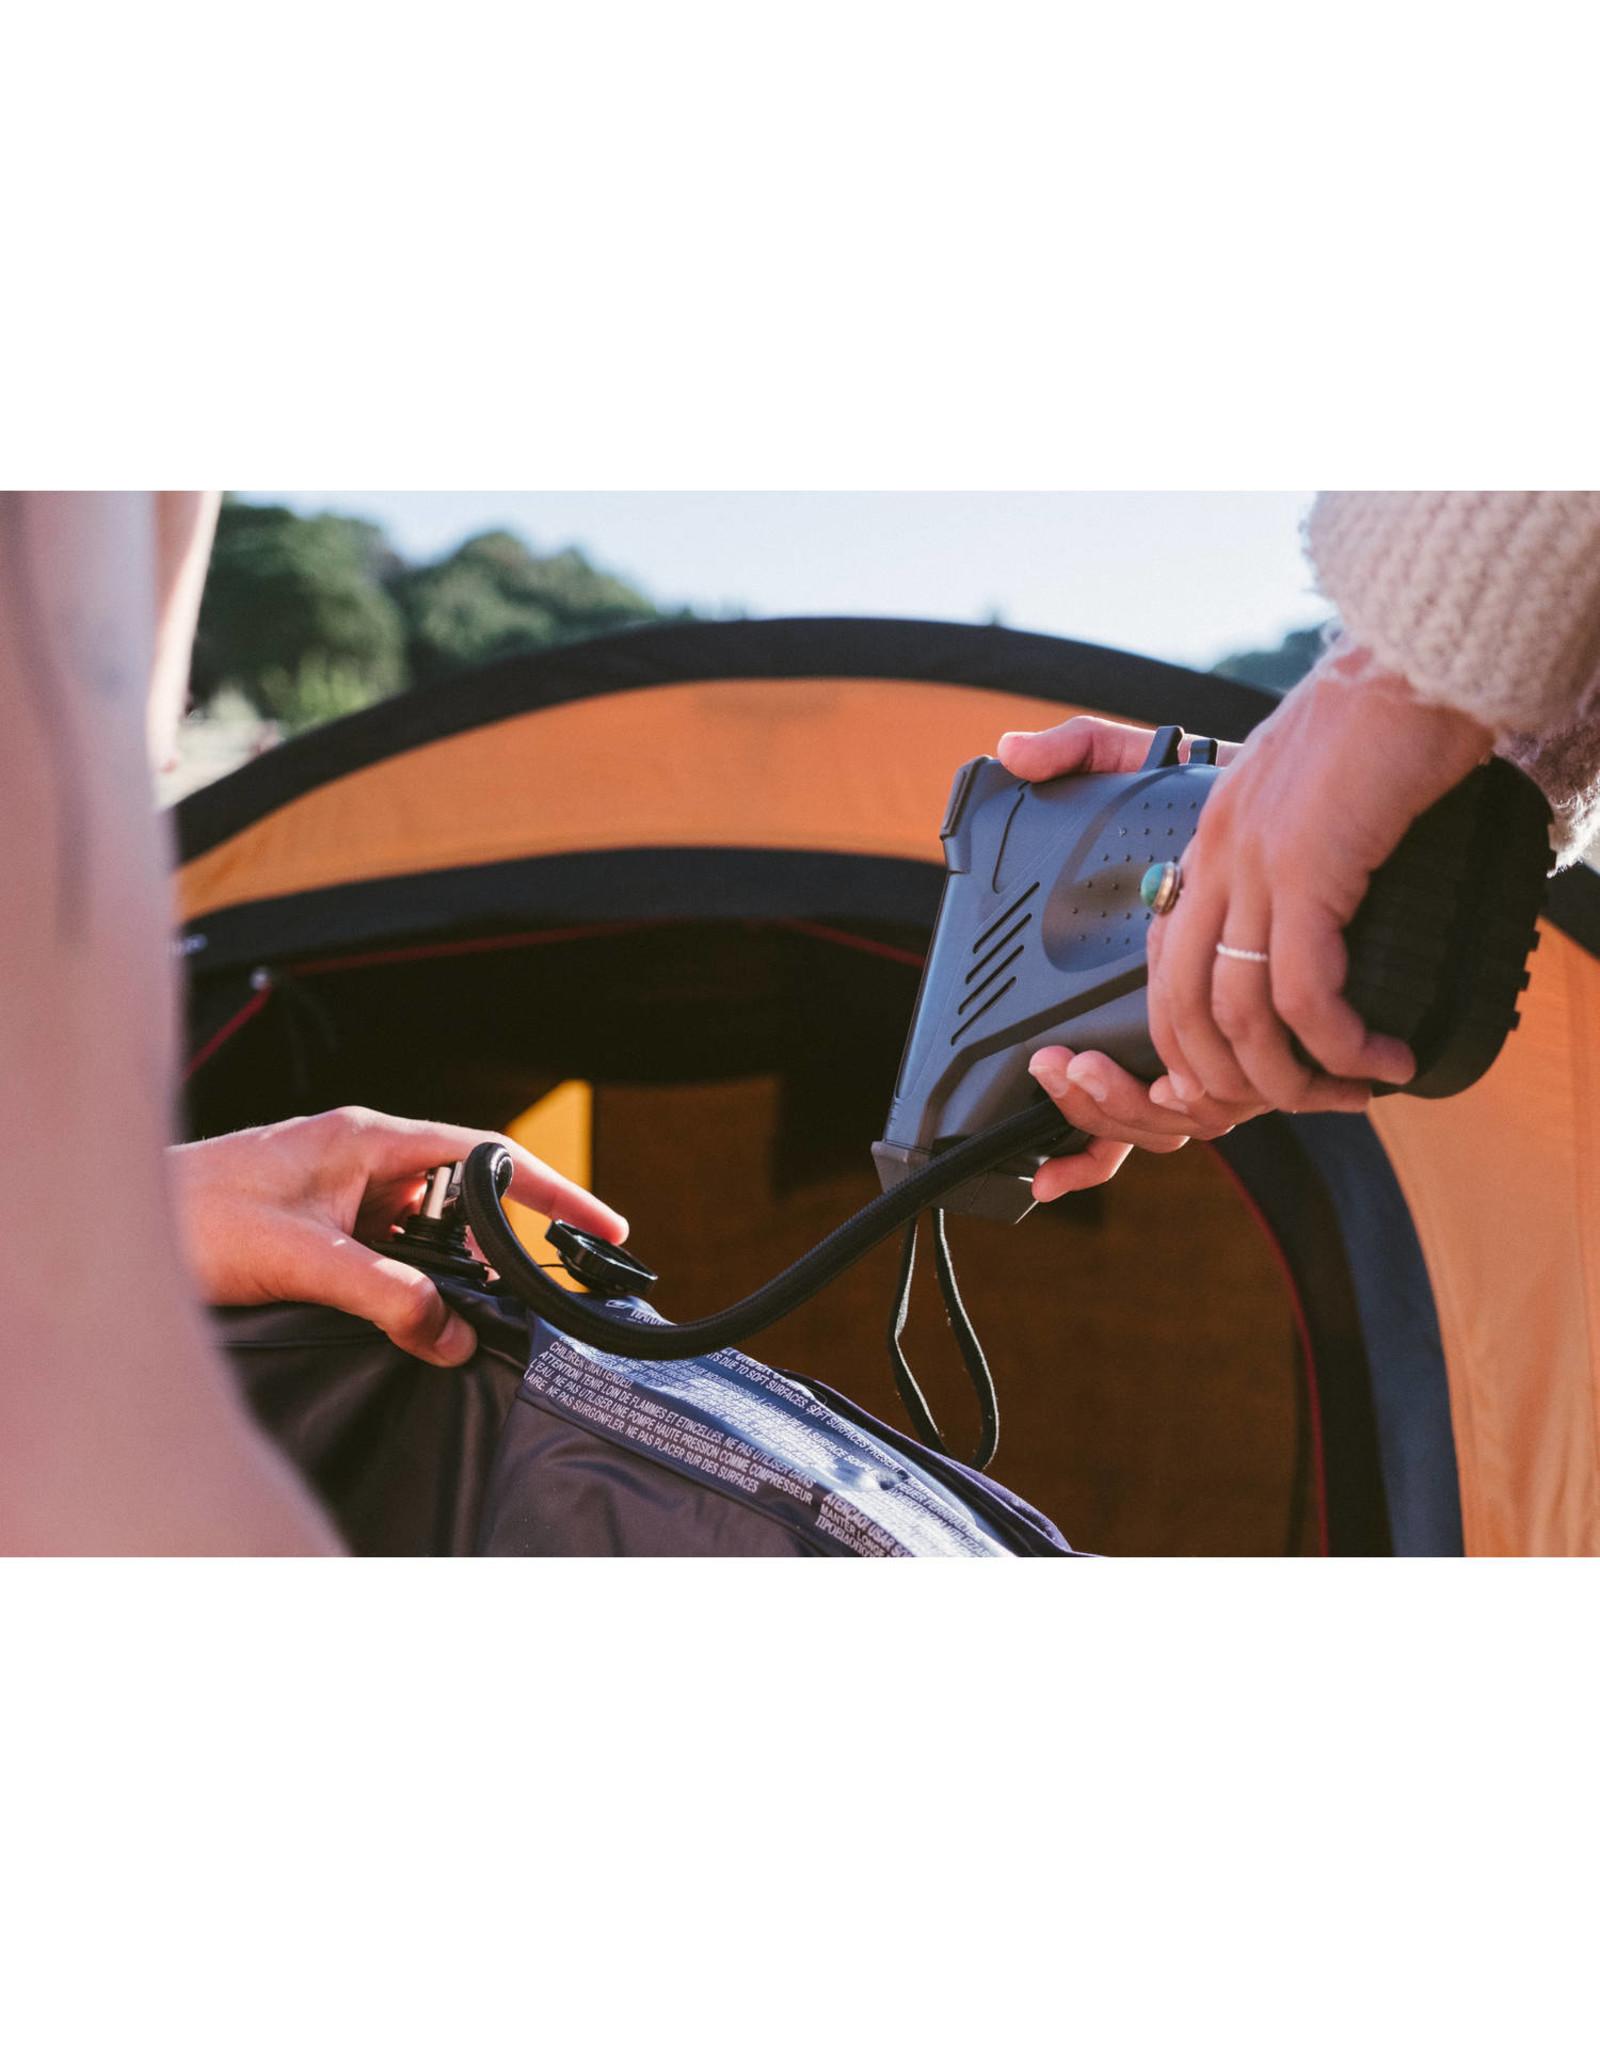 Vizu VIZU ExtremeX Handheld 150 psi Air Compressor with a built in 6000 mAh powerbank